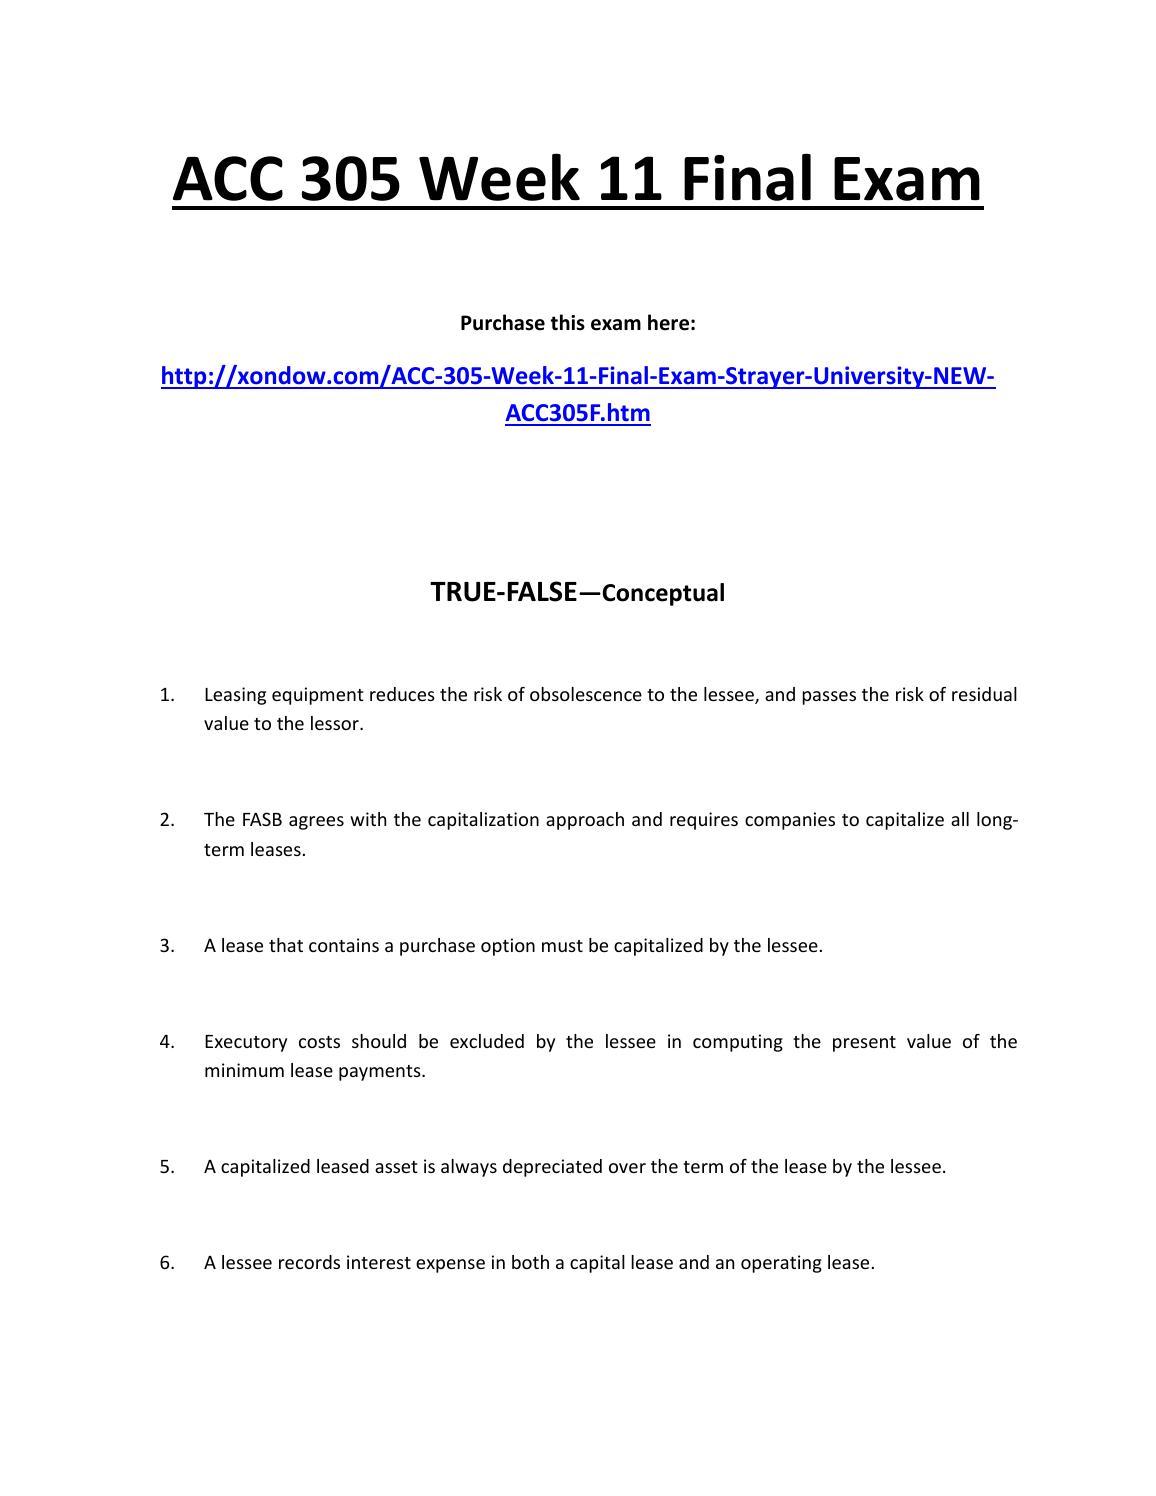 strayer university bleg 500 final exam